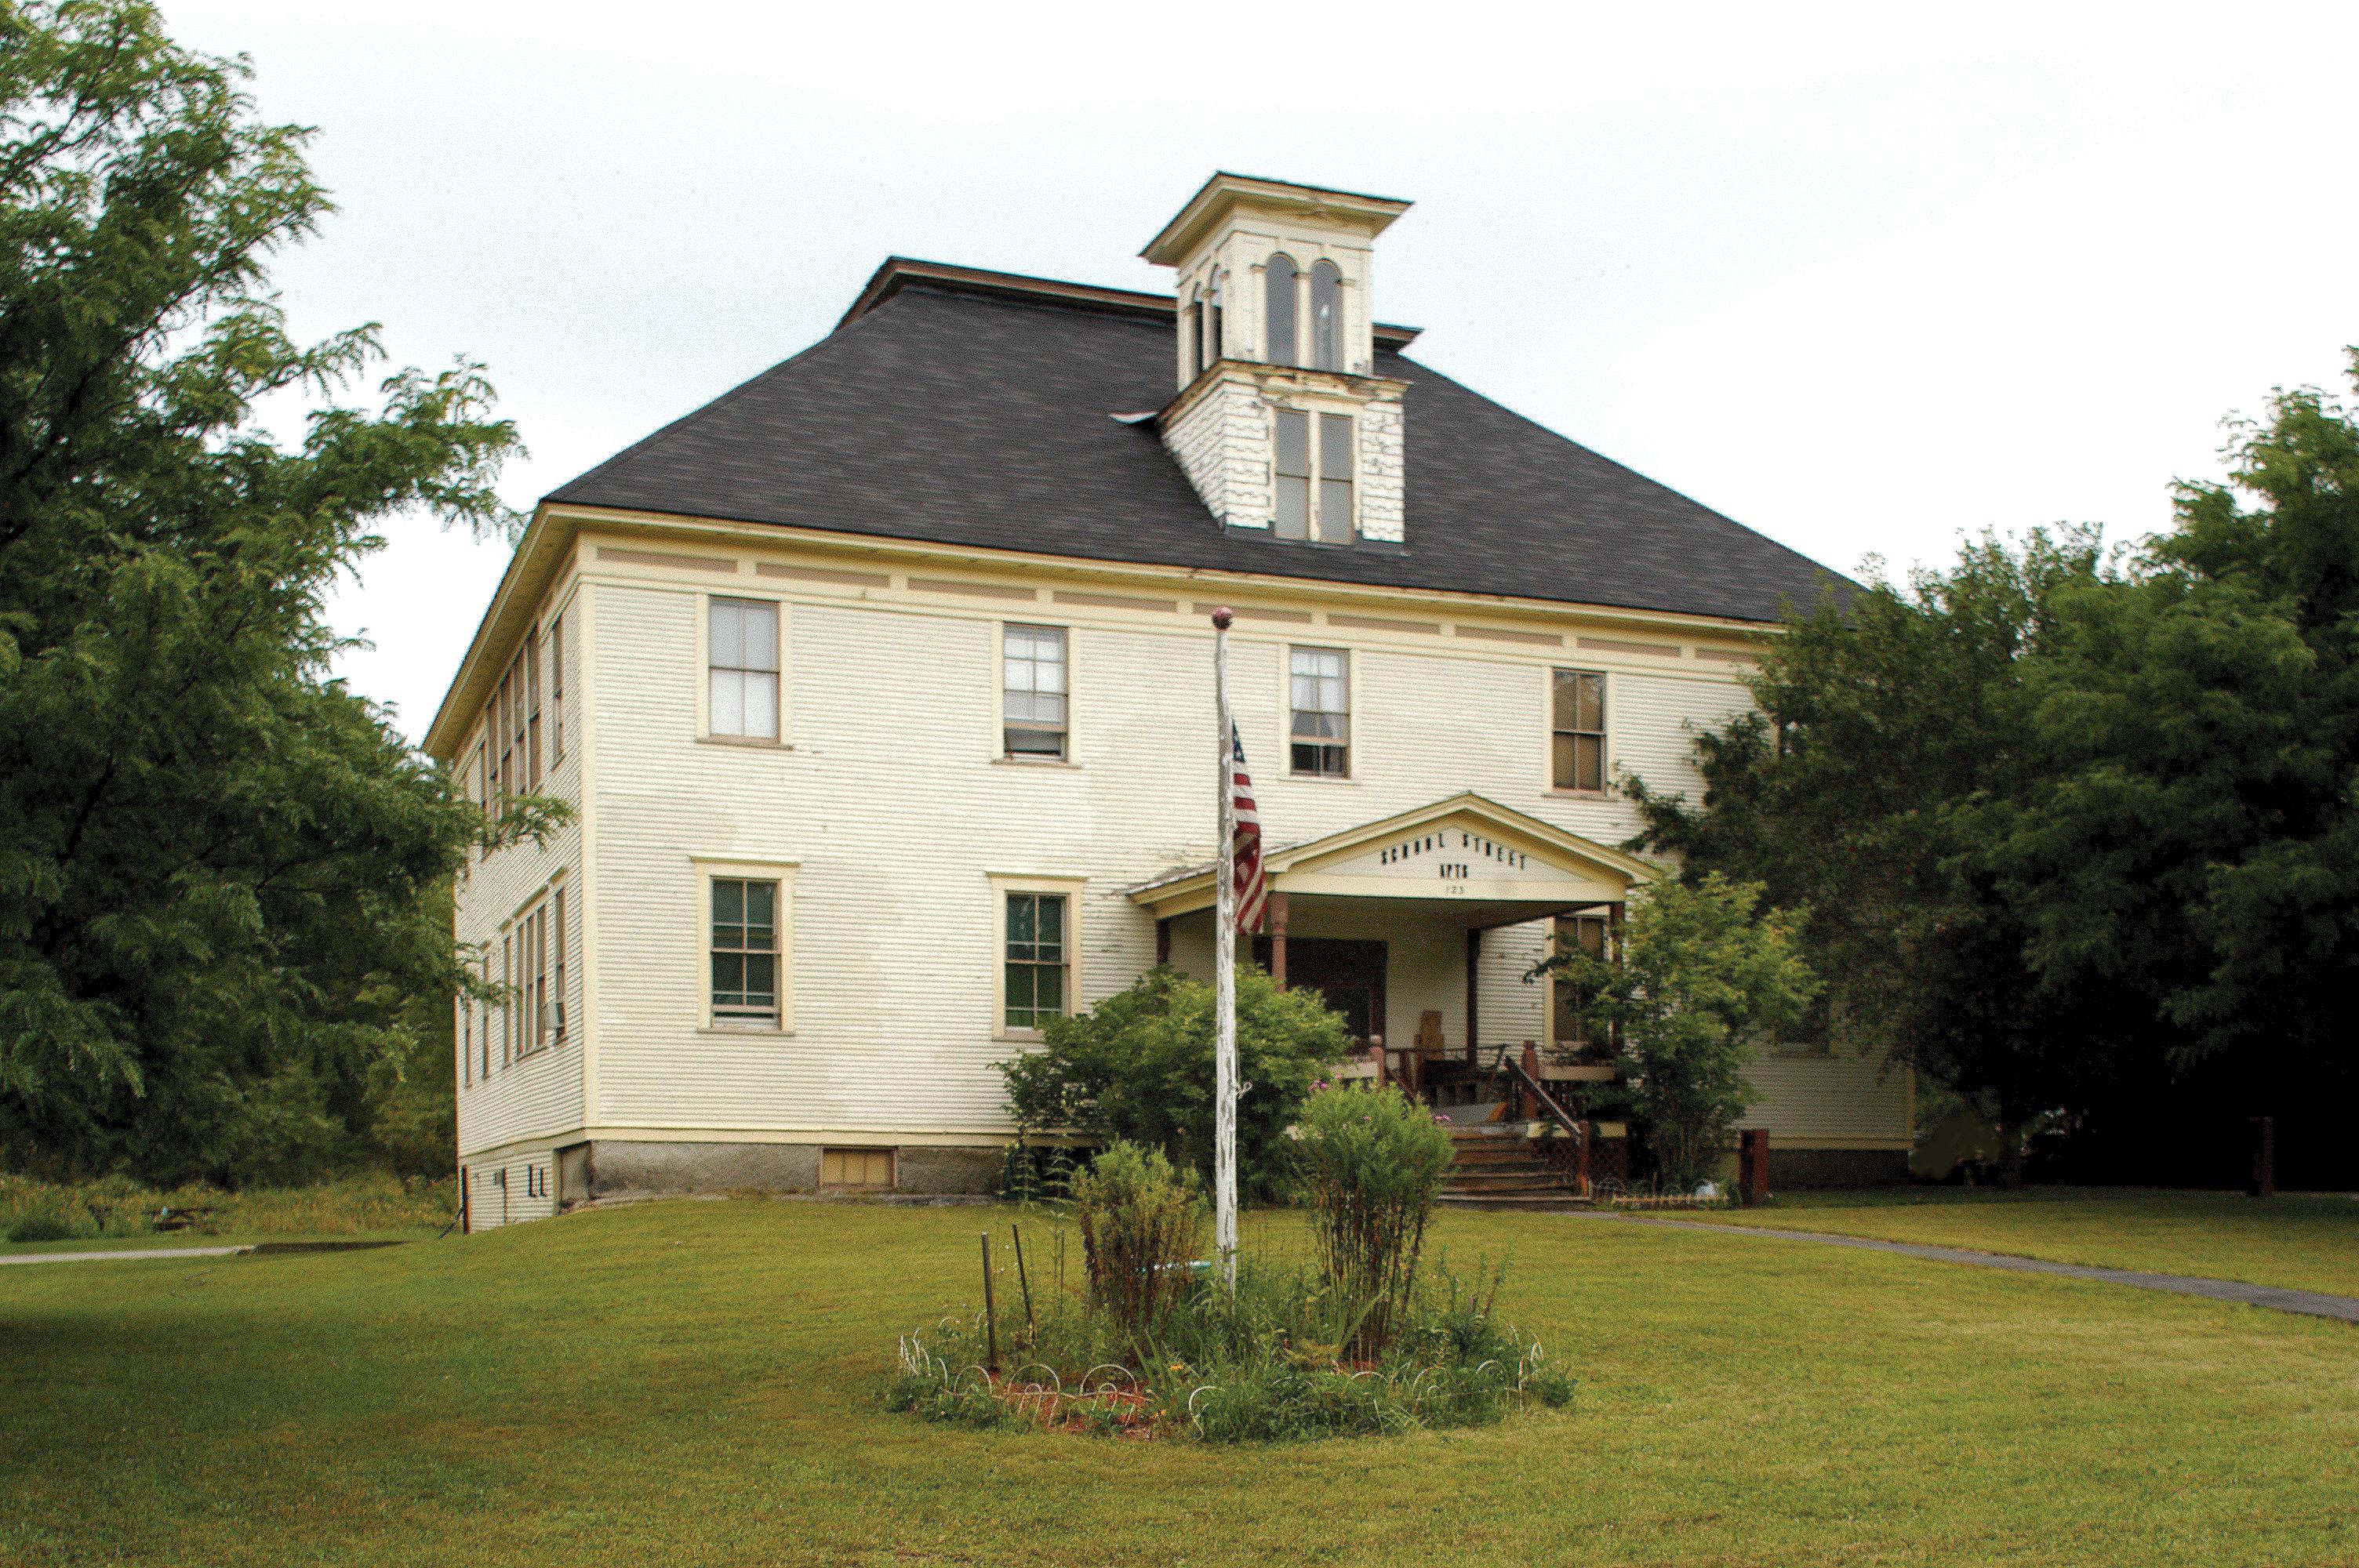 Historic Schoolhouse, Plainfield